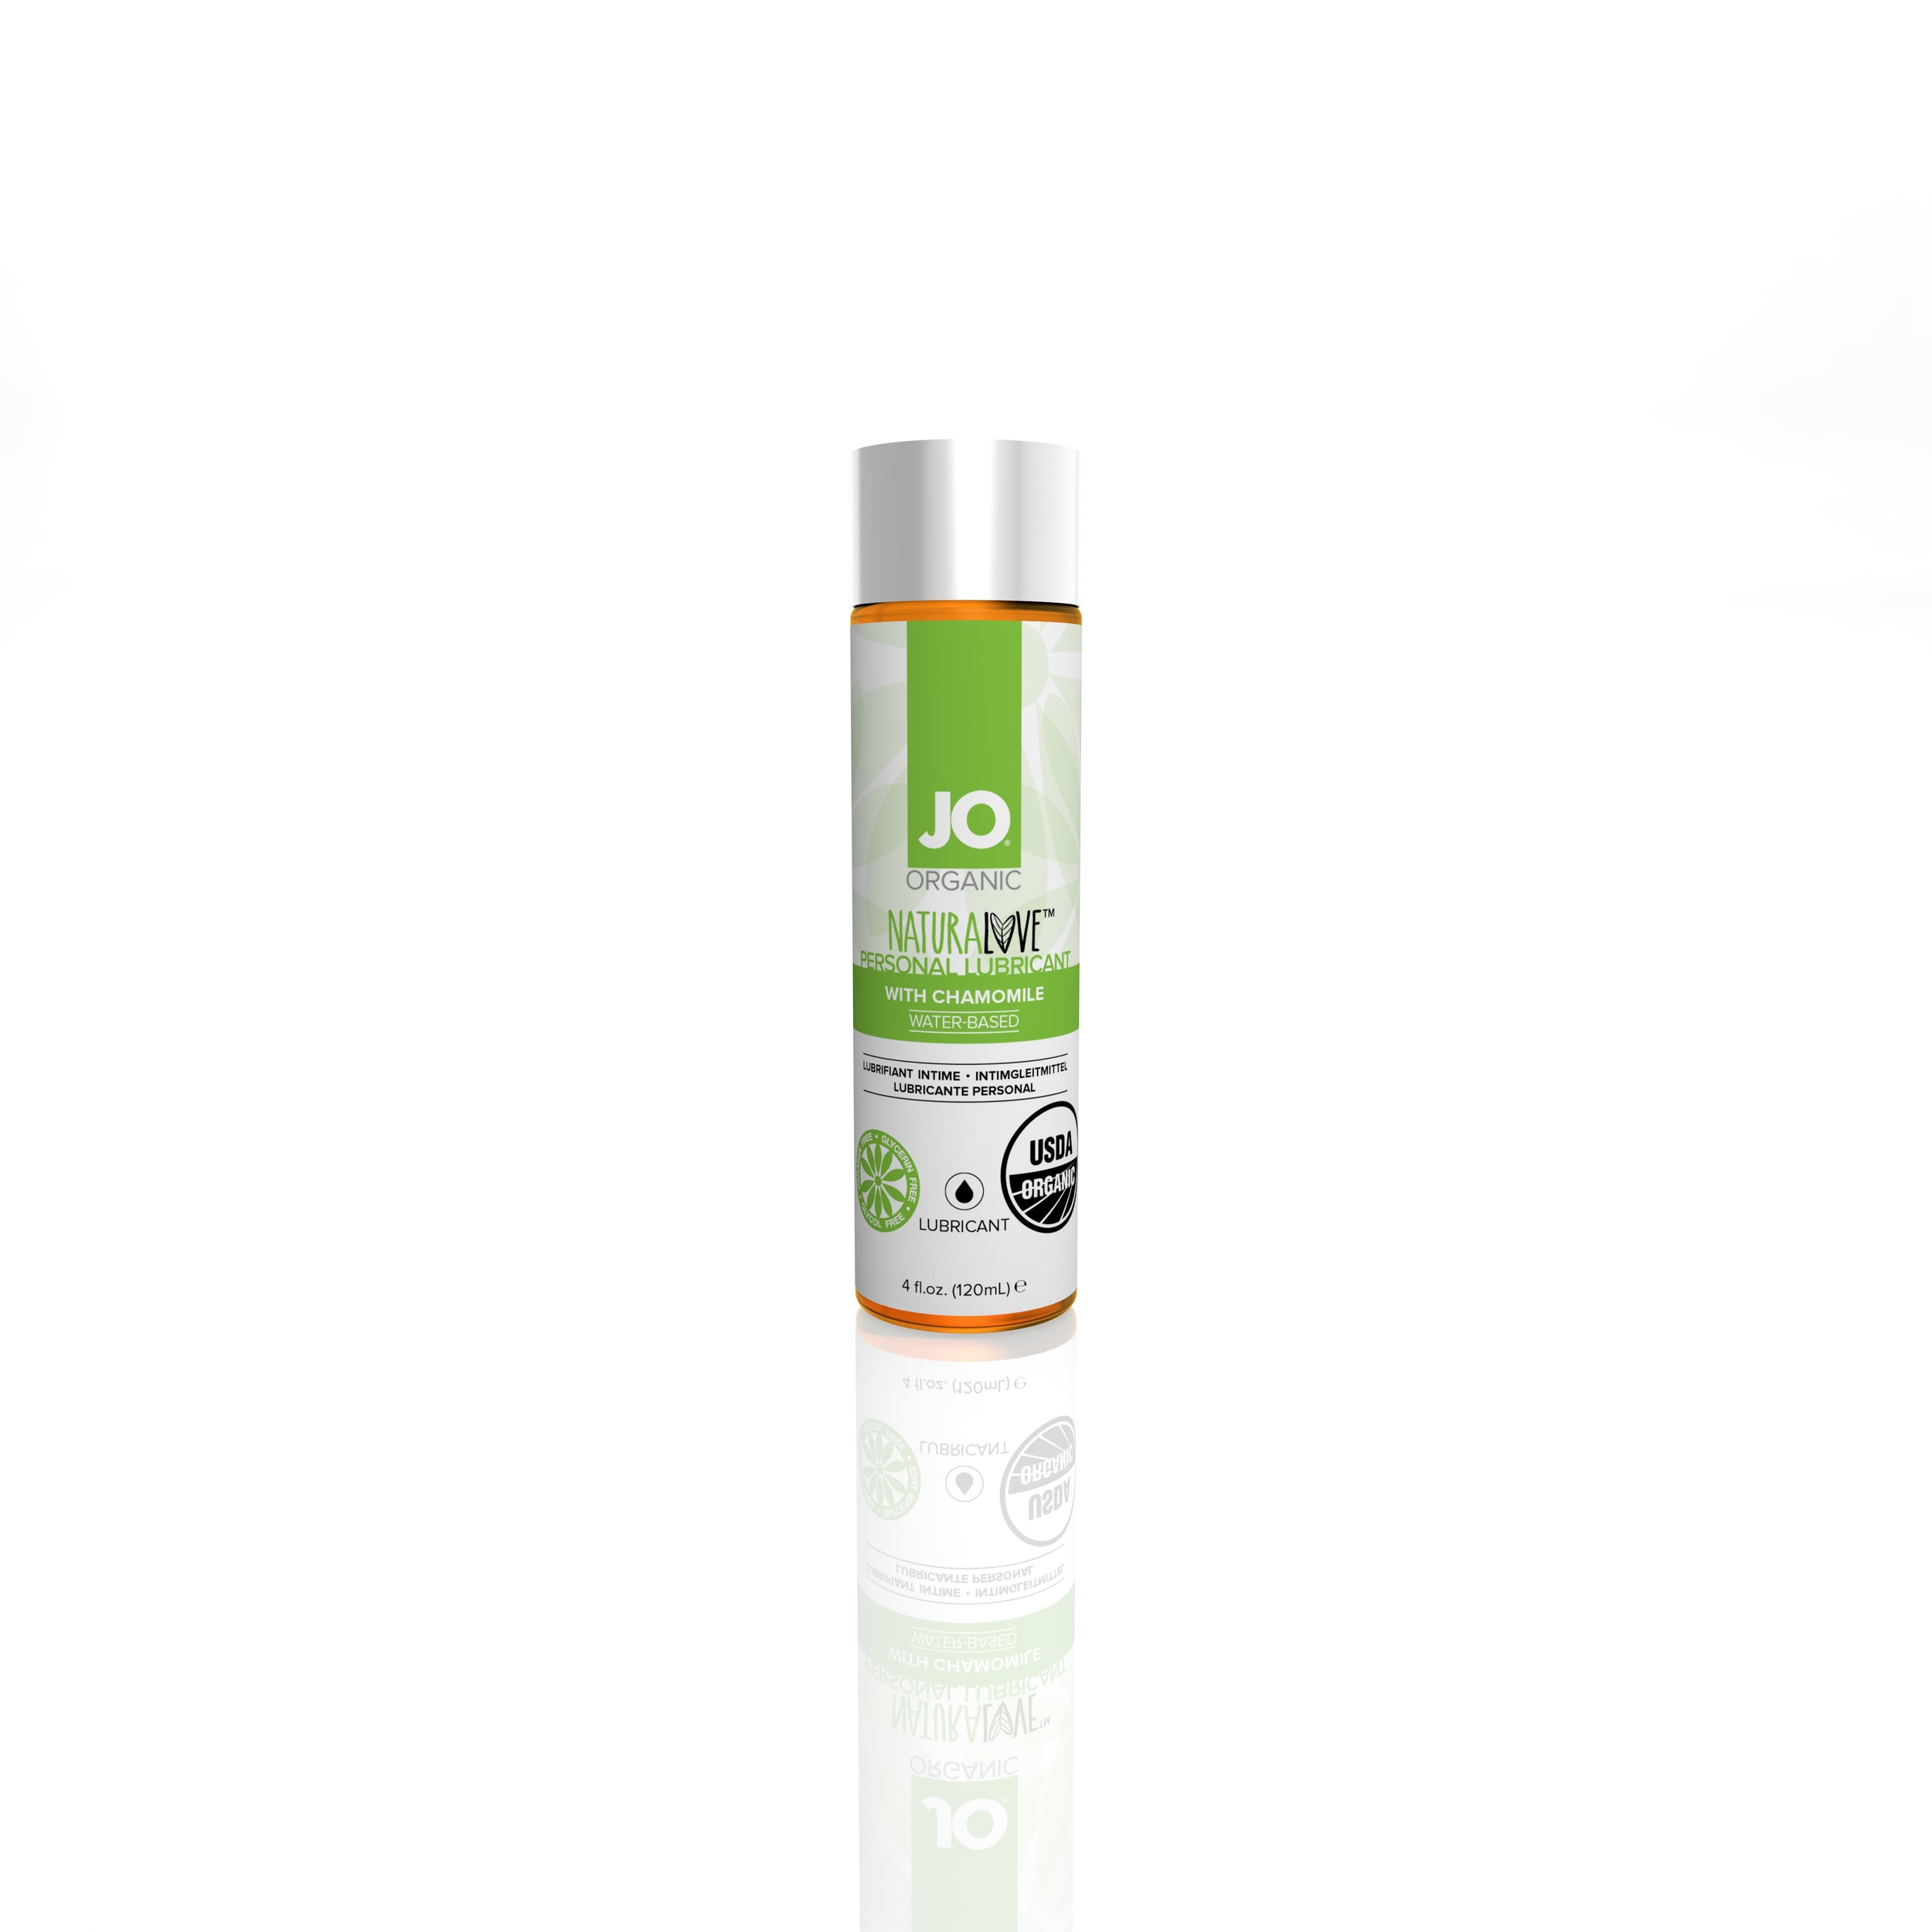 JO USDA Organic 4oz Original Lubricant (straight on) (white)001.jpg